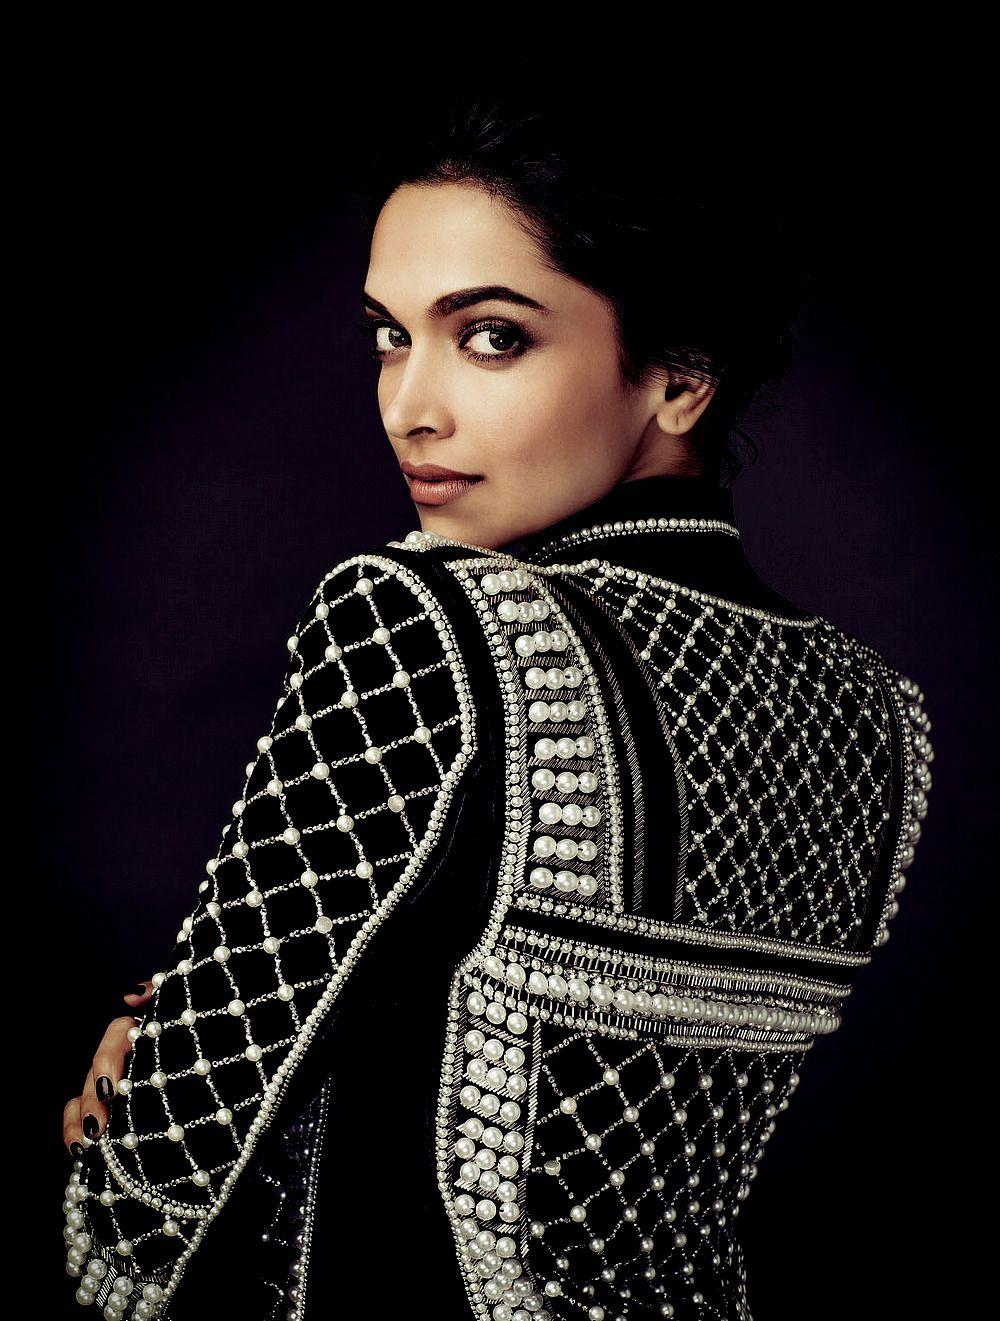 Pin by Ирина Молчанова on Deepika Padukone | Bollywood ...